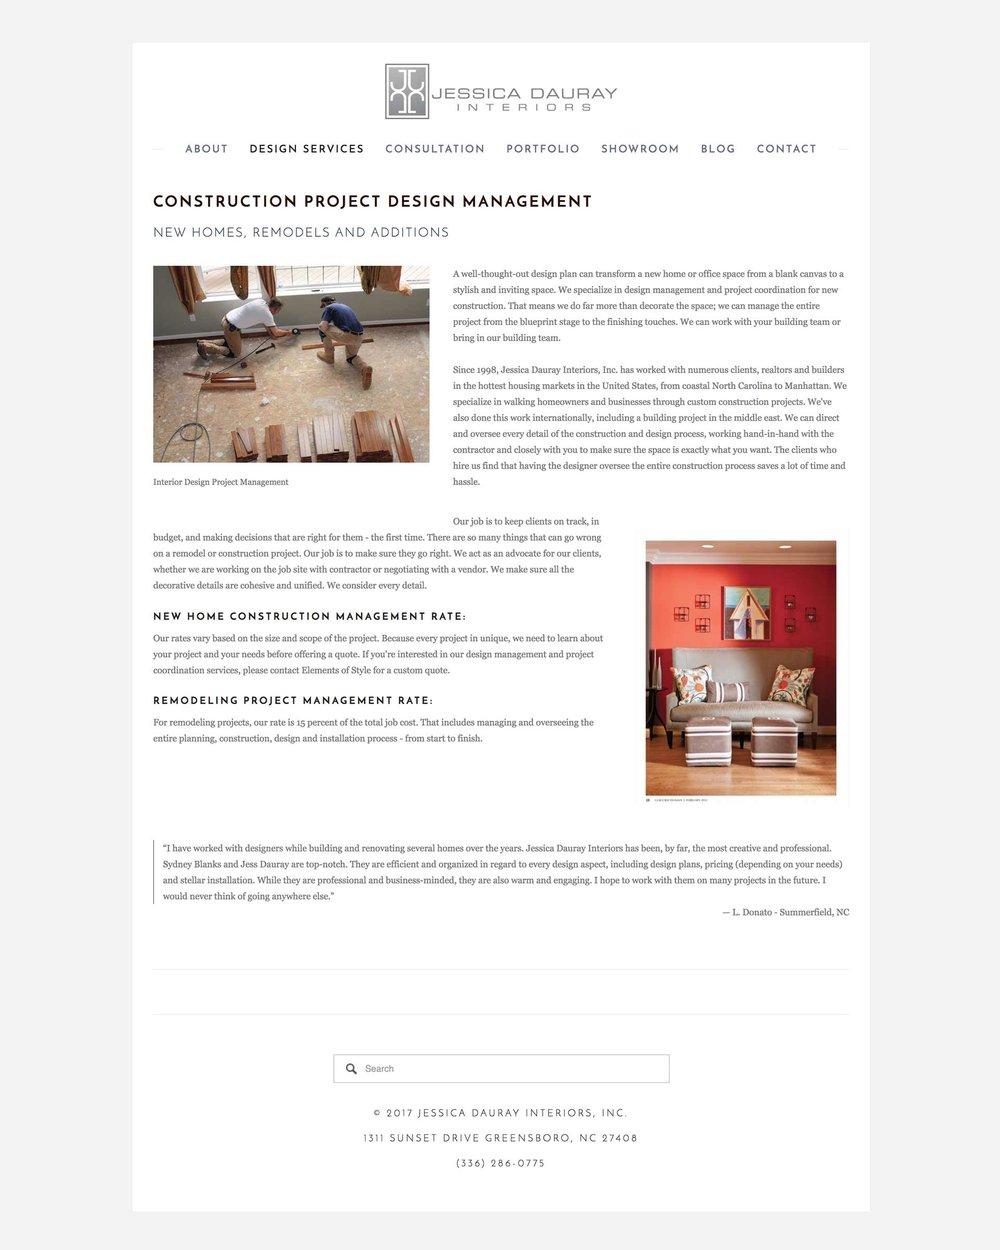 Jessica Dauray Interiors Gallery Squarespace Website Design